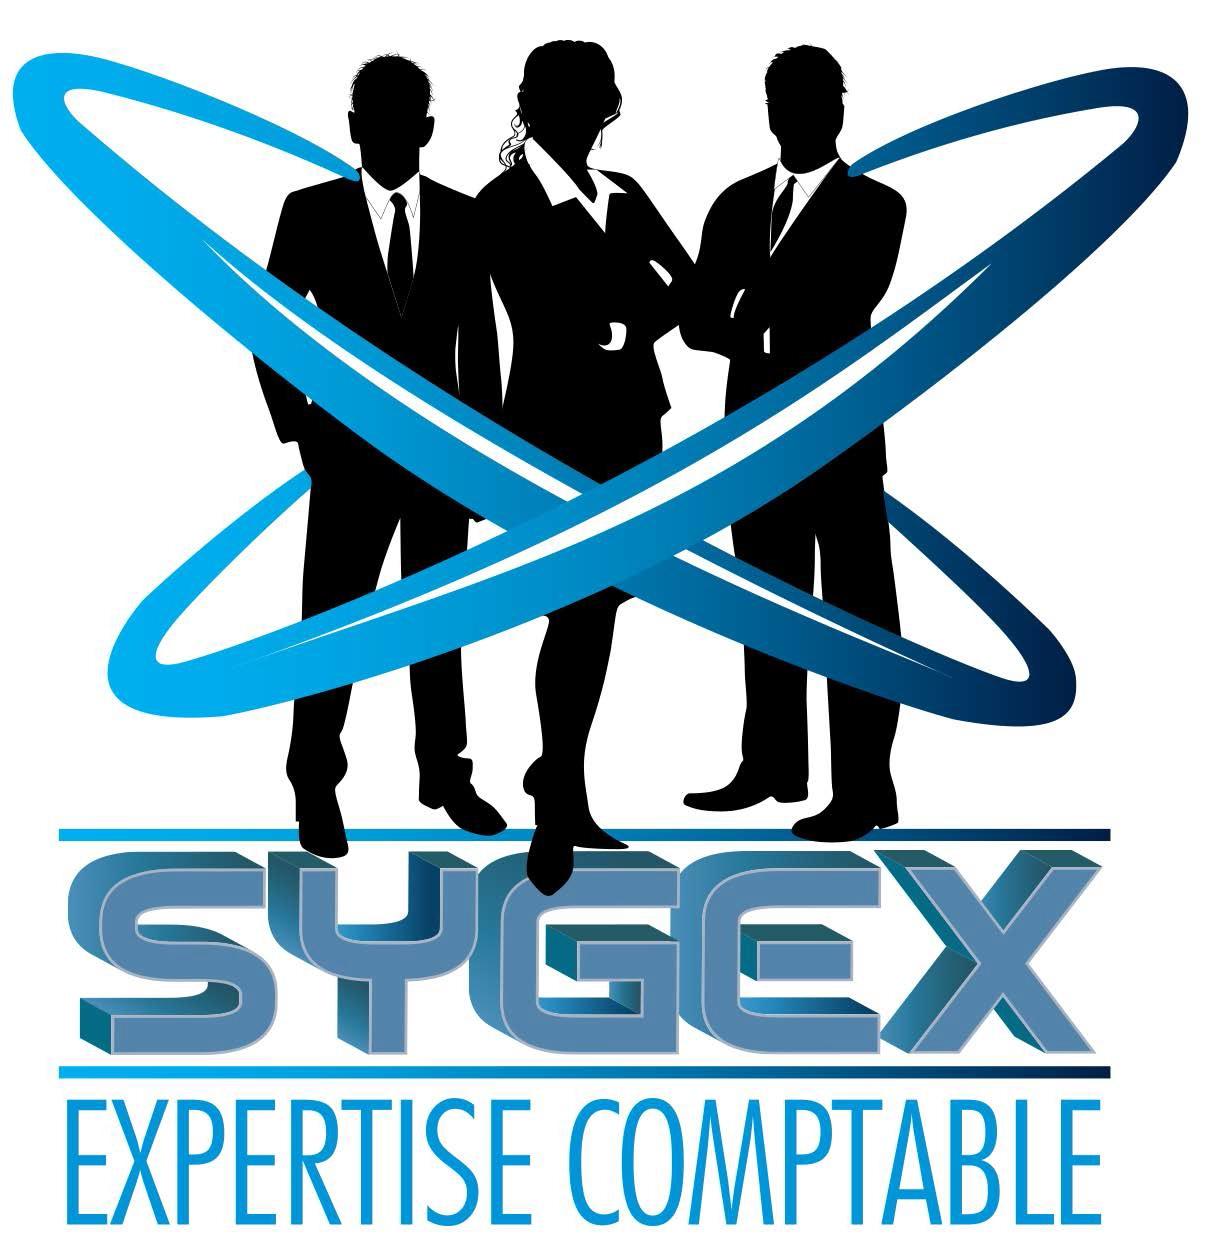 SYGEX EXPERTISE COMPTABLE - QUIMPER - MORLAIX